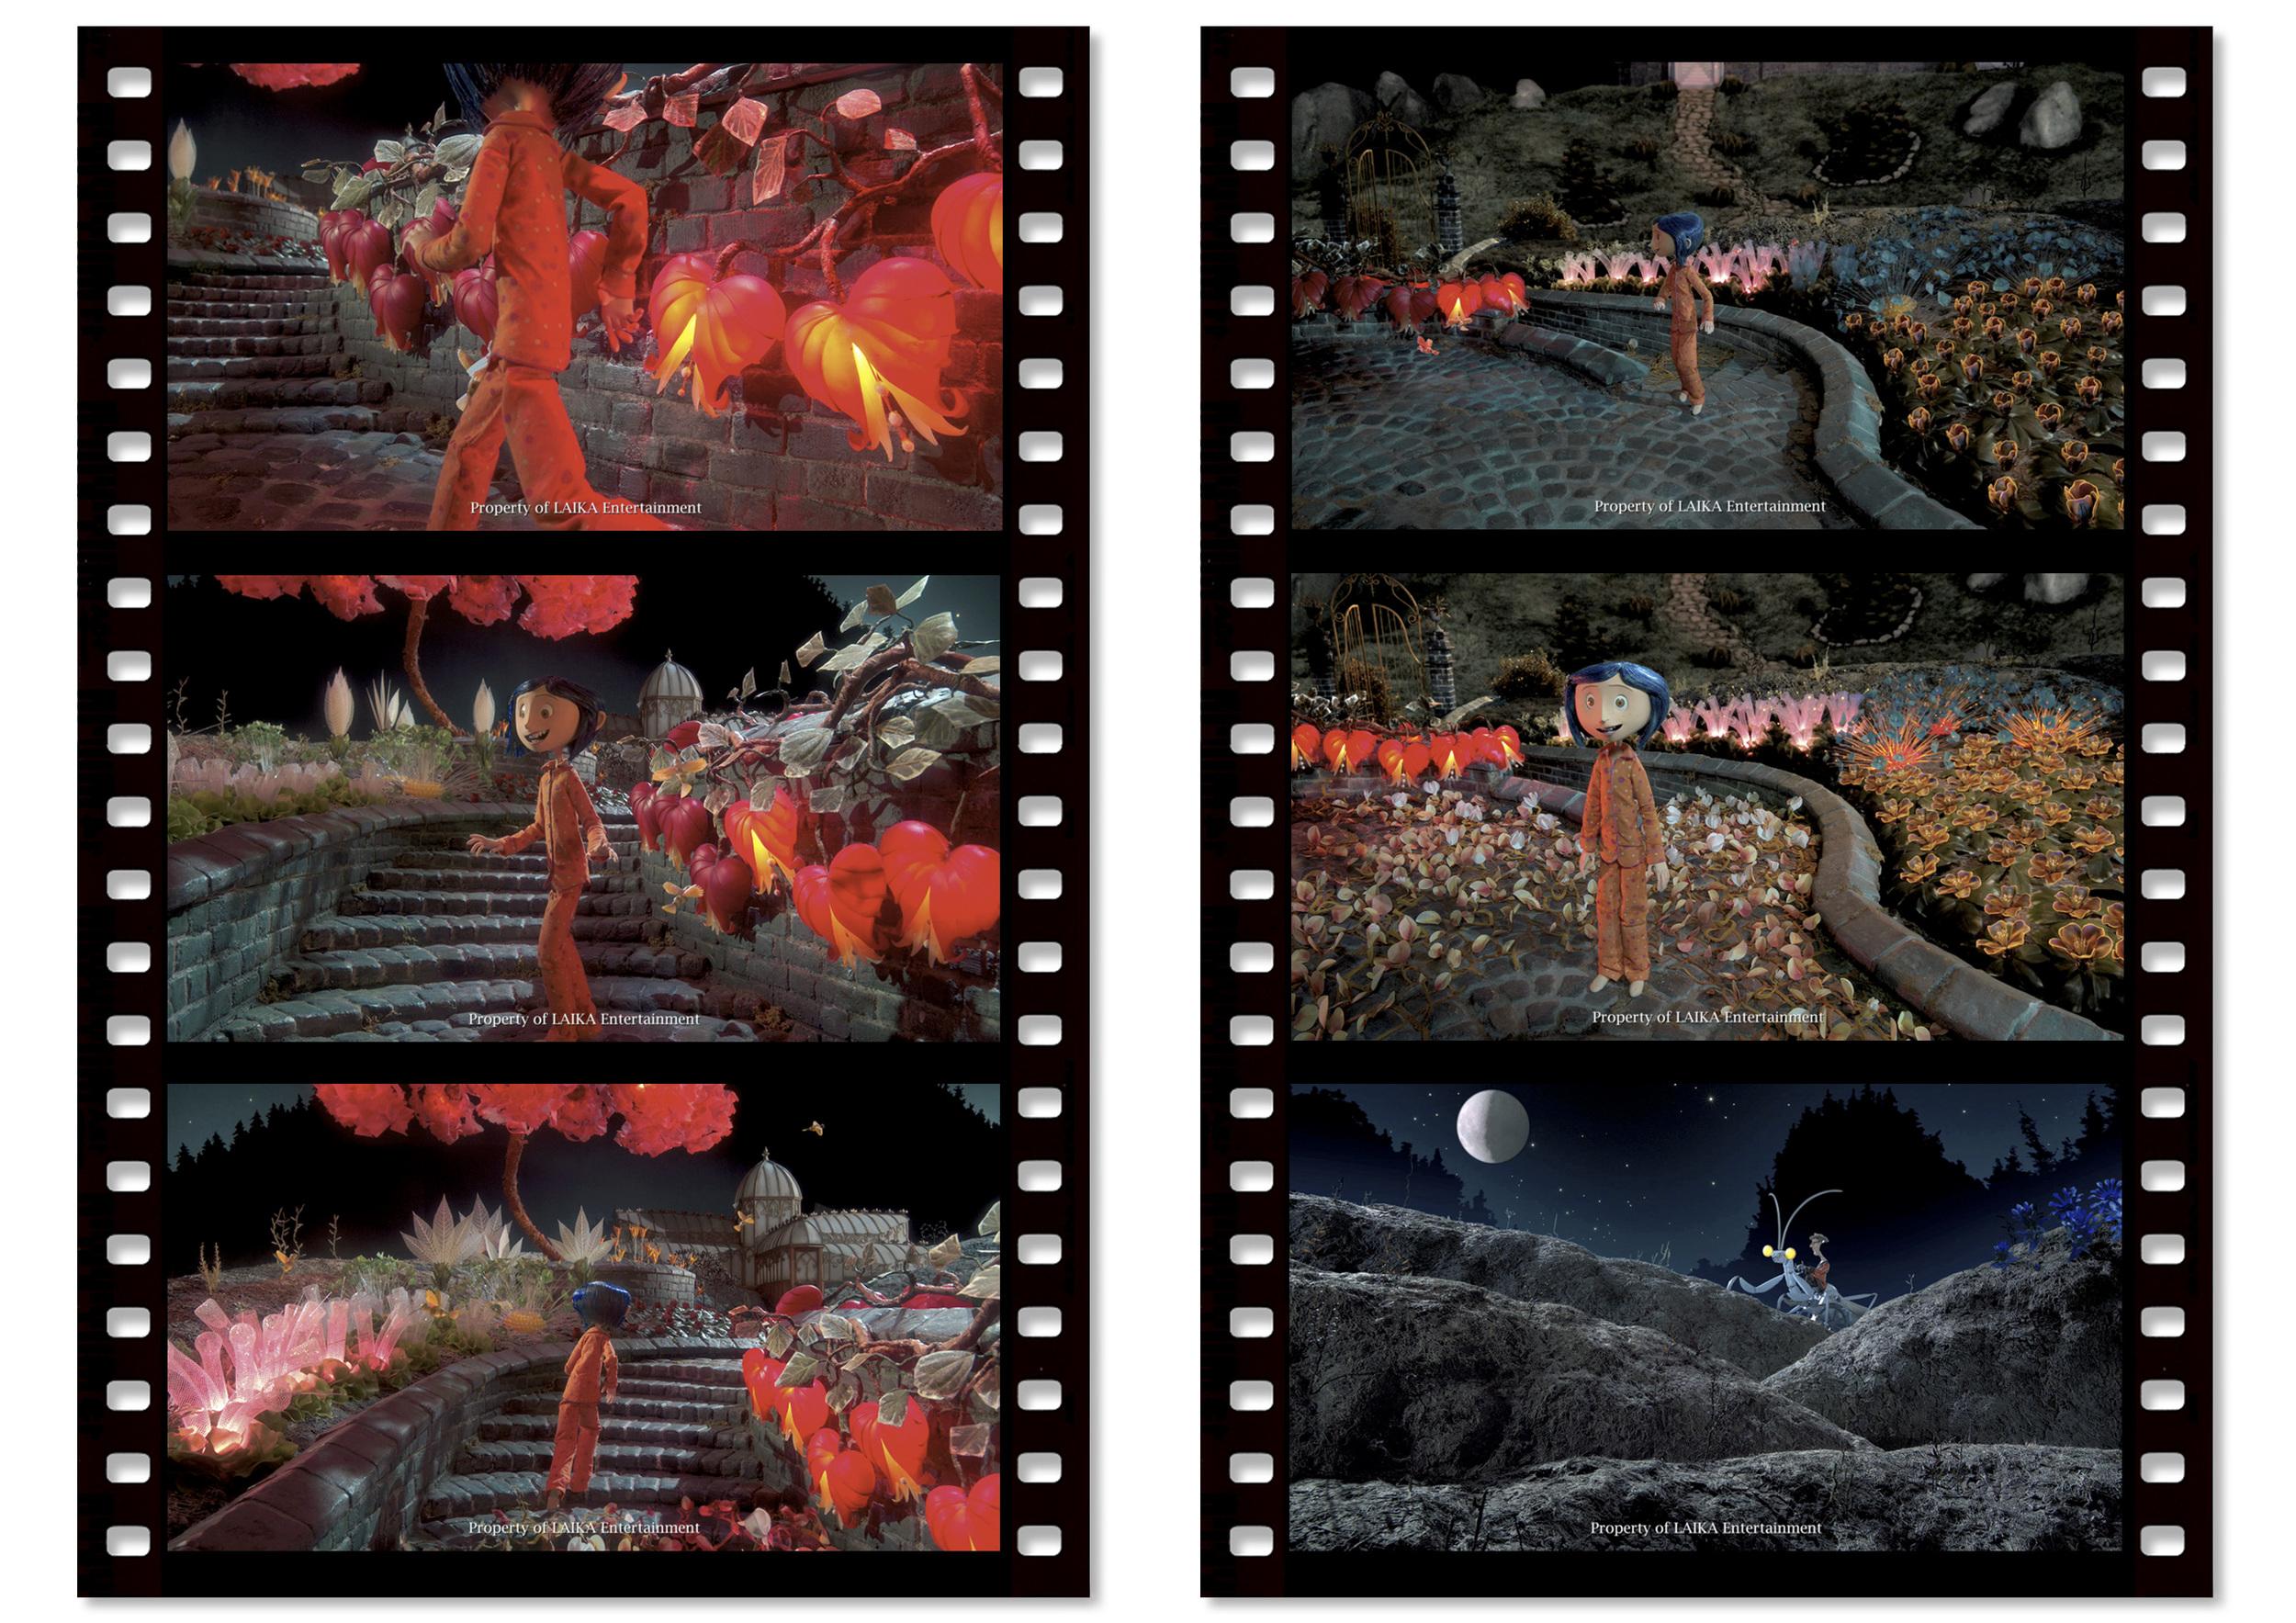 Coraline 6 images 3.jpg